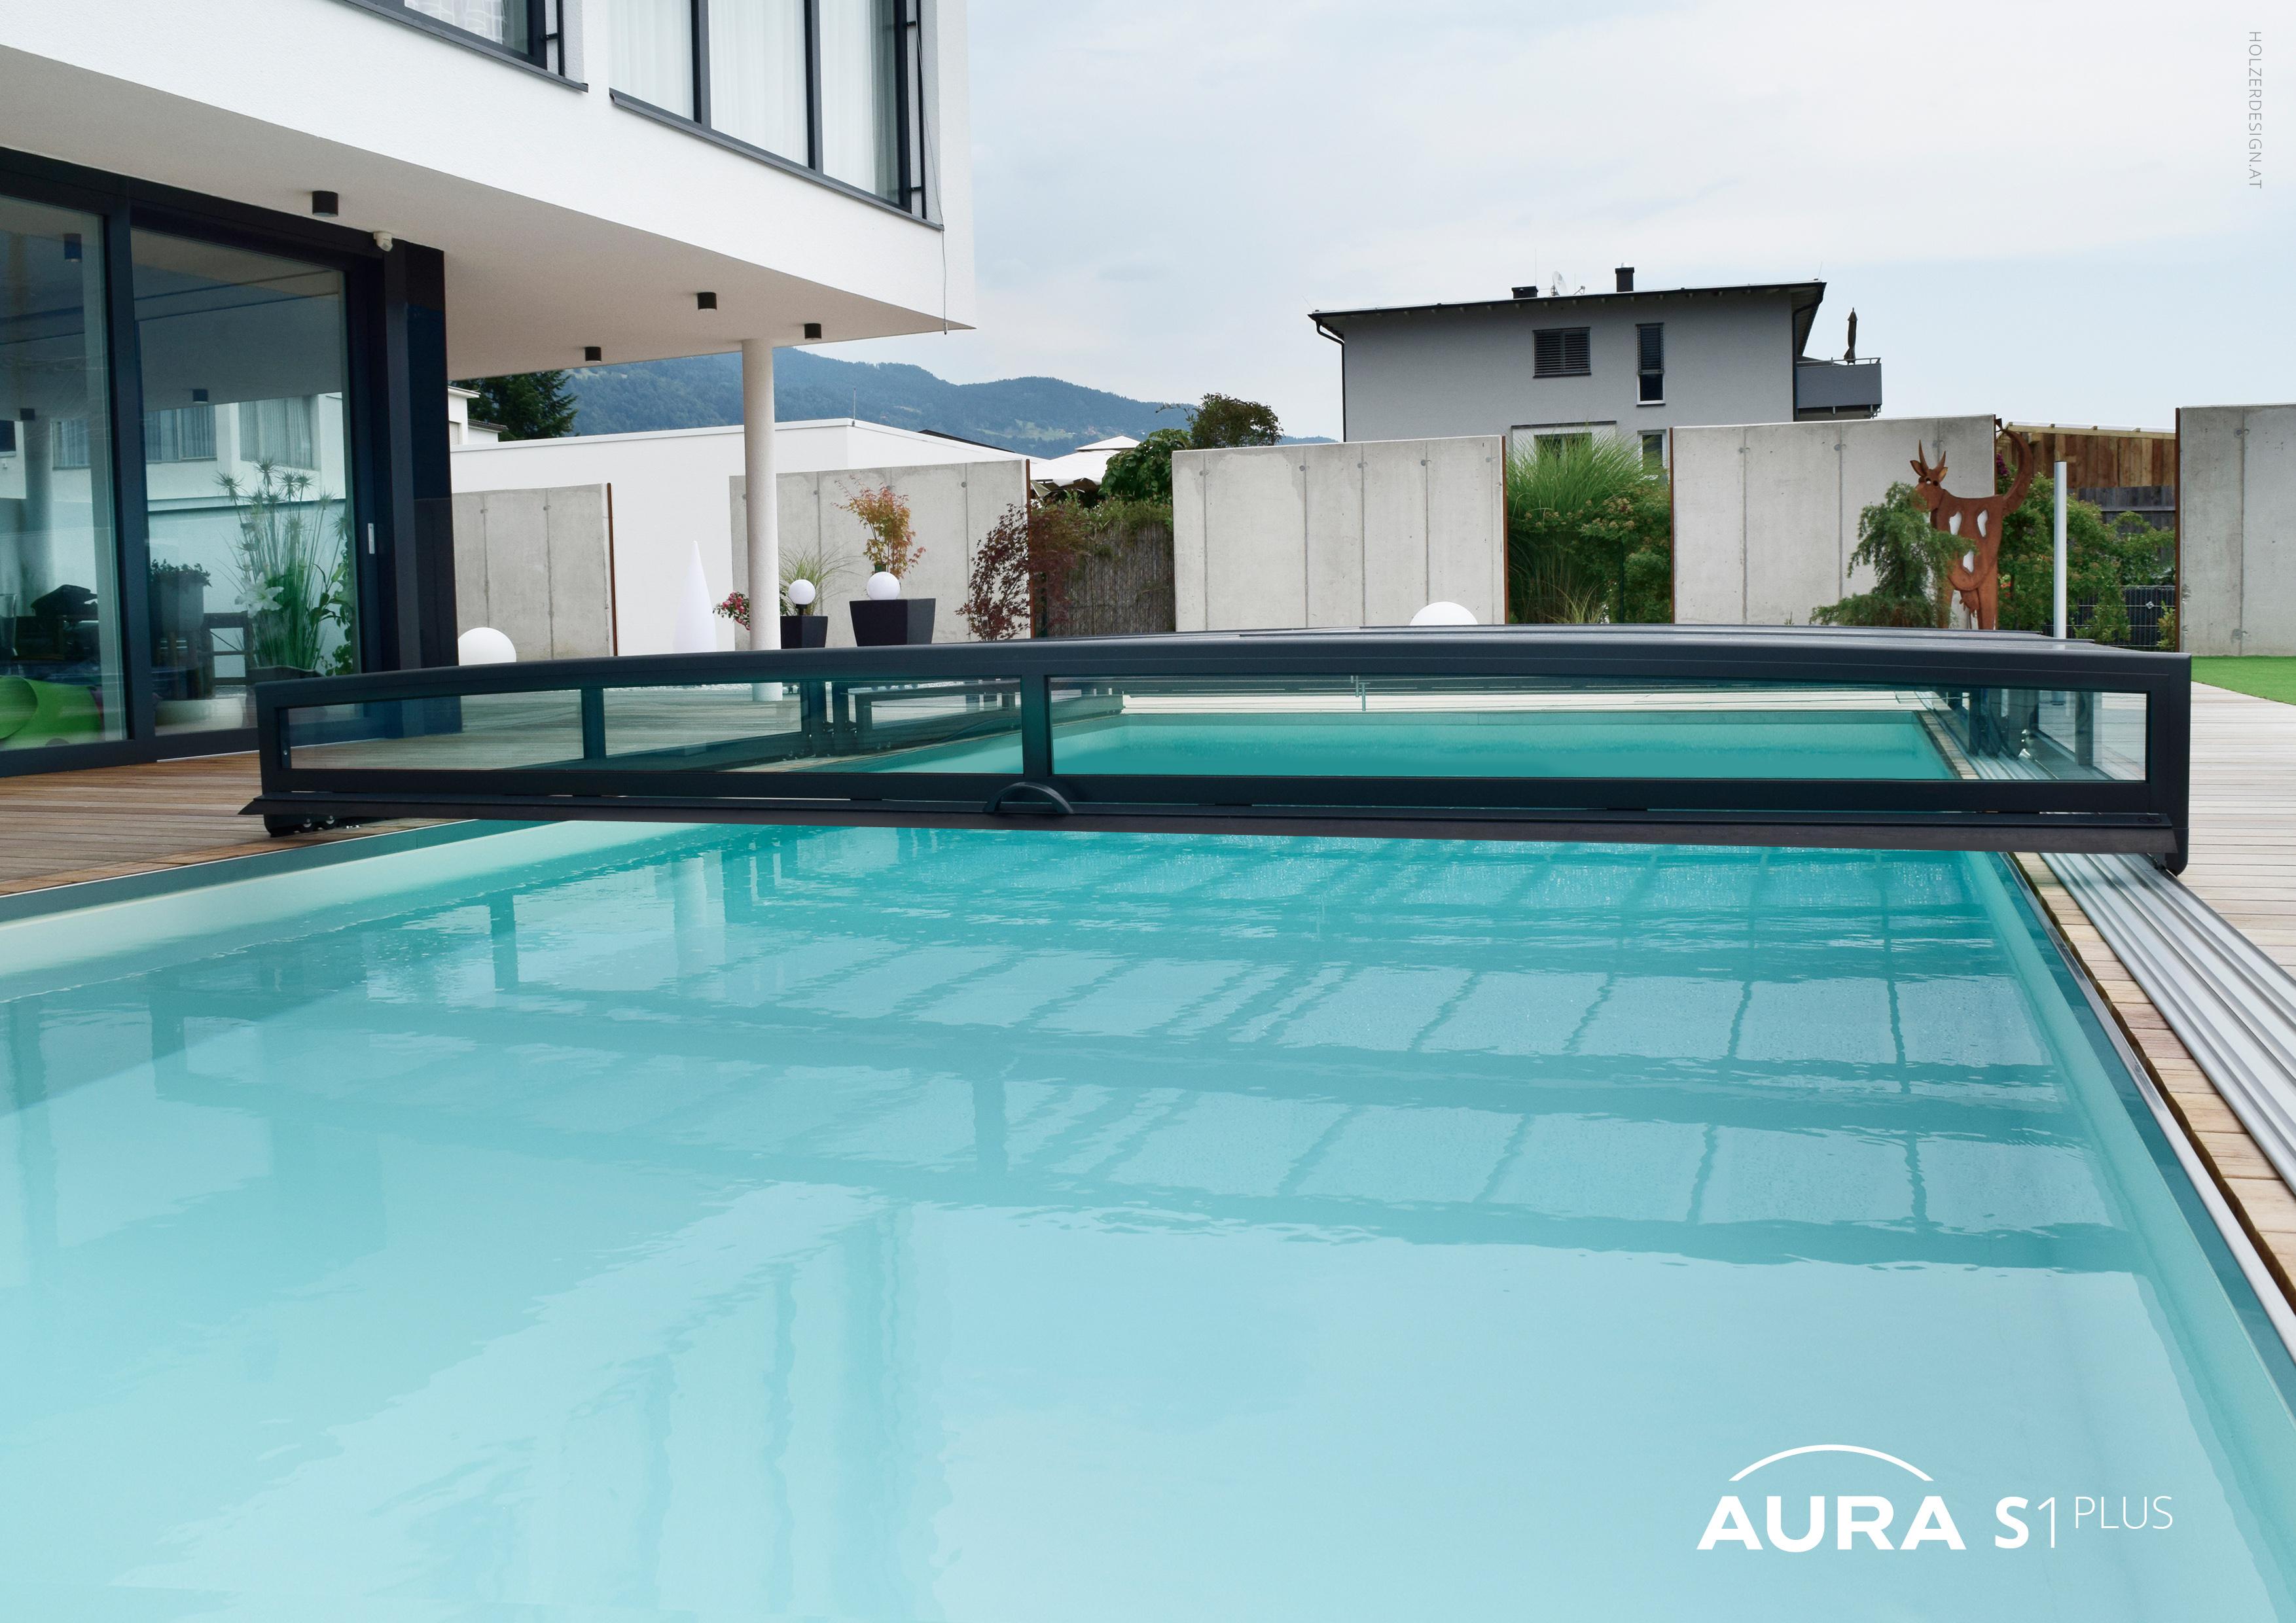 aura-s1plus-9-19.jpg